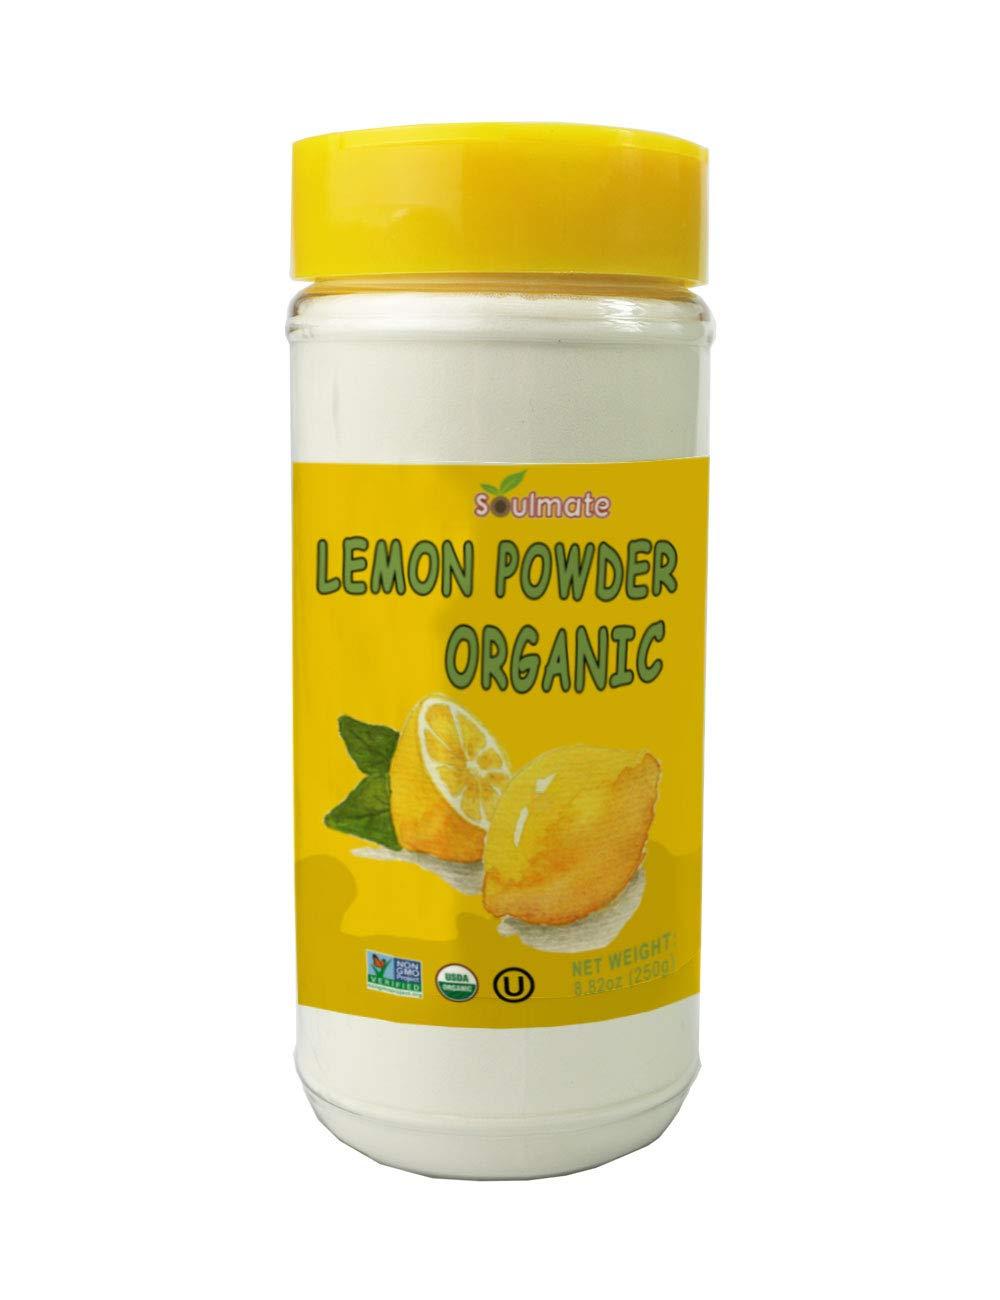 Soulmate Organic Lemon Juice Powder 100% Meyer Lemon 8.82 Oz Large Shaker,All Natural,No Additives,USDA Kosher (250g)